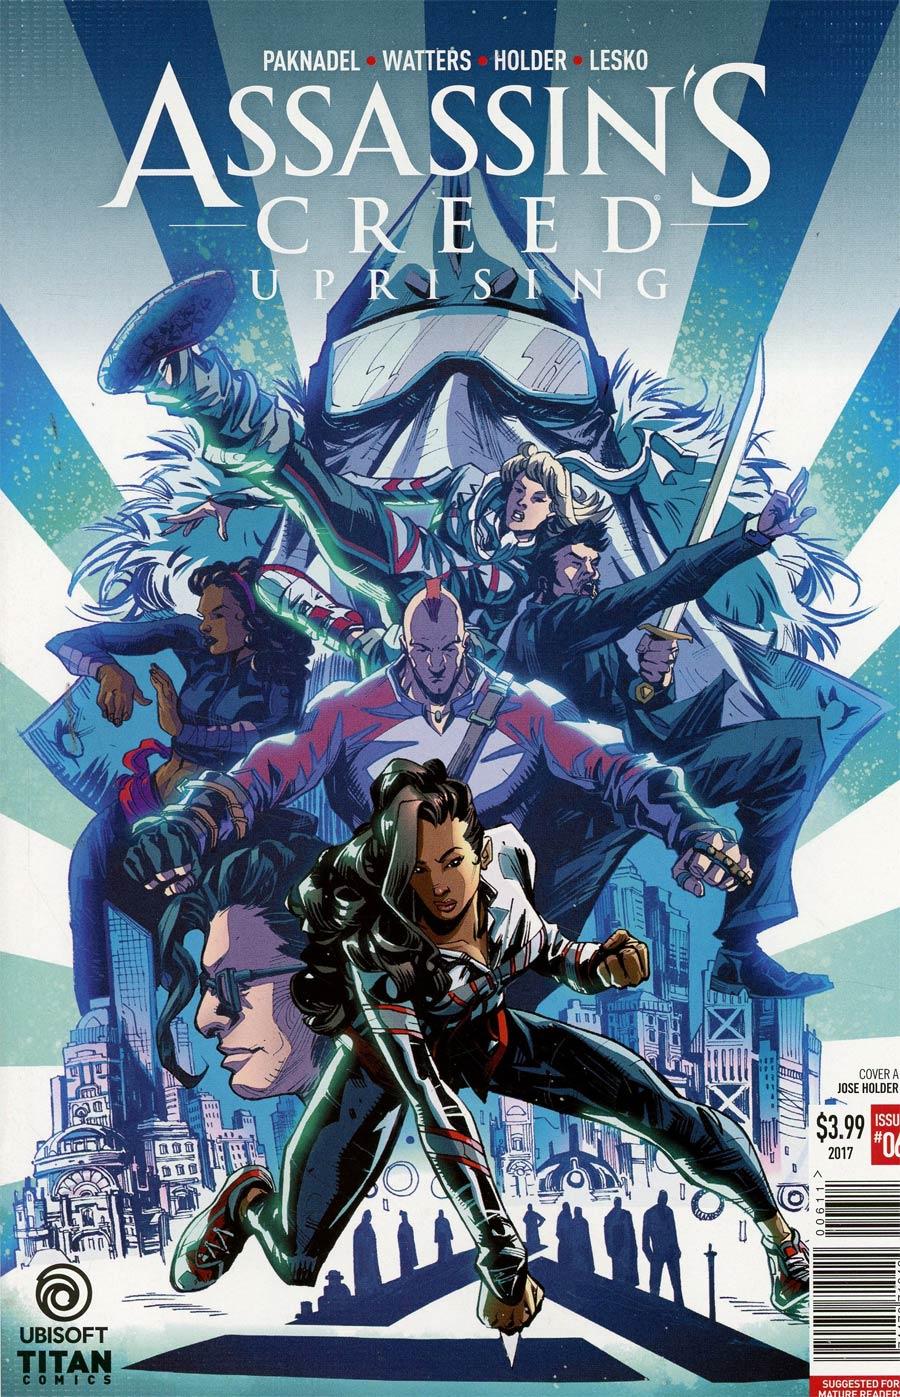 Assassins Creed Uprising #6 Cover A Regular Jose Holder Cover